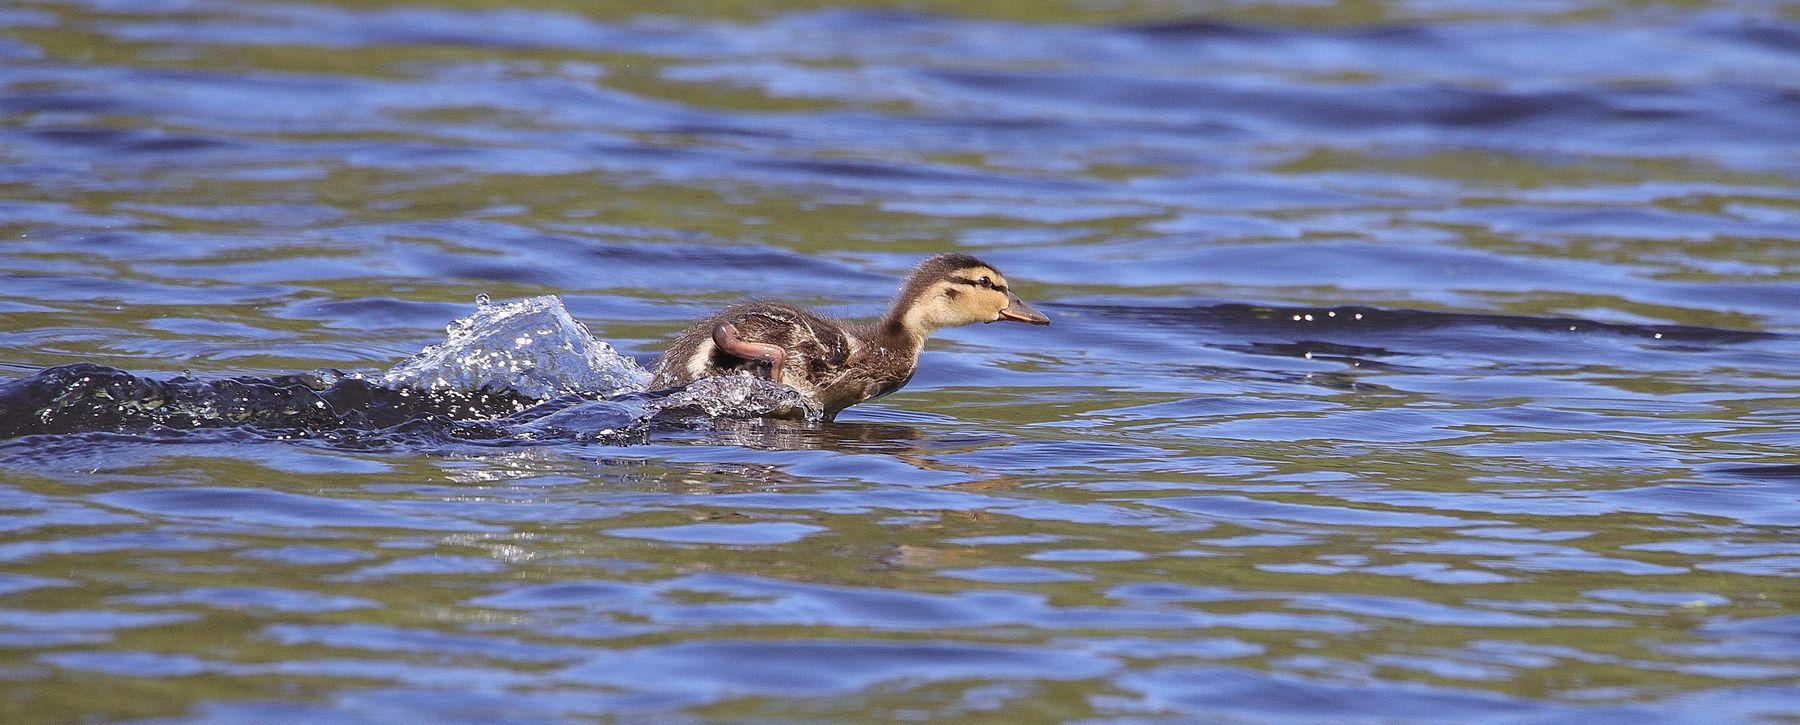 """олимпийский резерв"" птицы водоплавающие утки птенец"